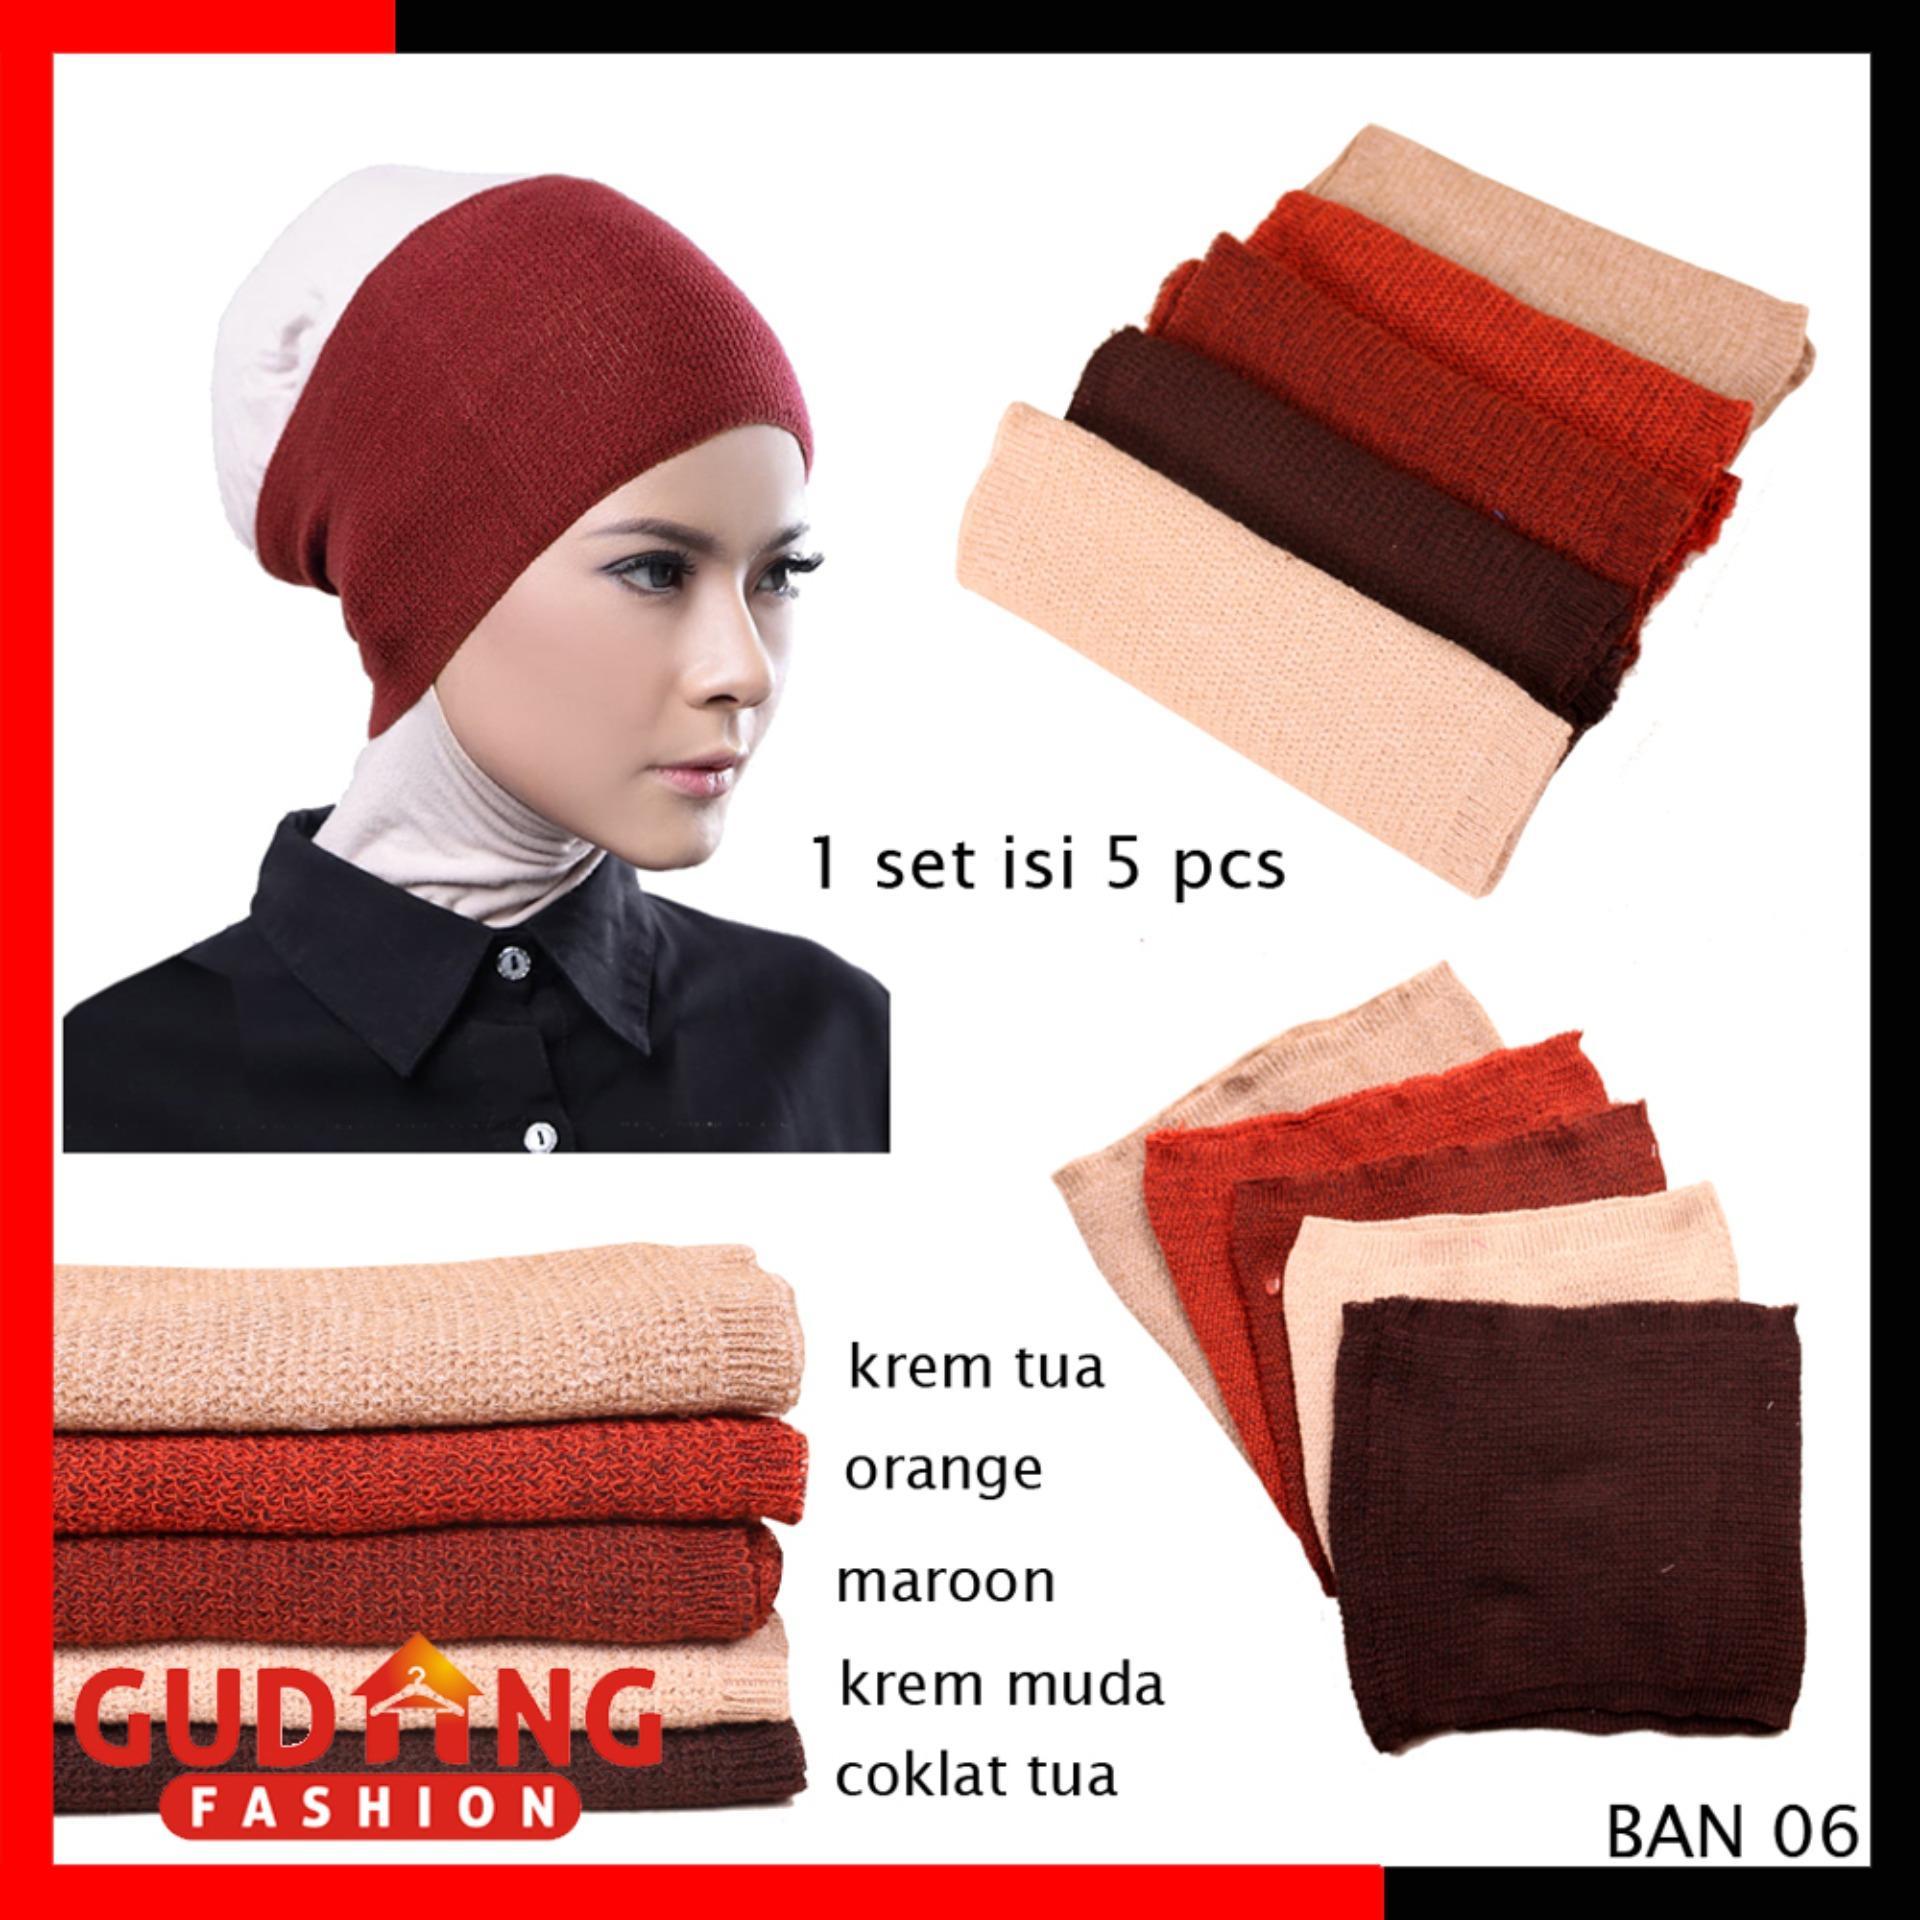 Gudang Fashion - Bandana Ciput Rajut 2 Warna Murah Isi 5 Pcs - Kombinasi Warna